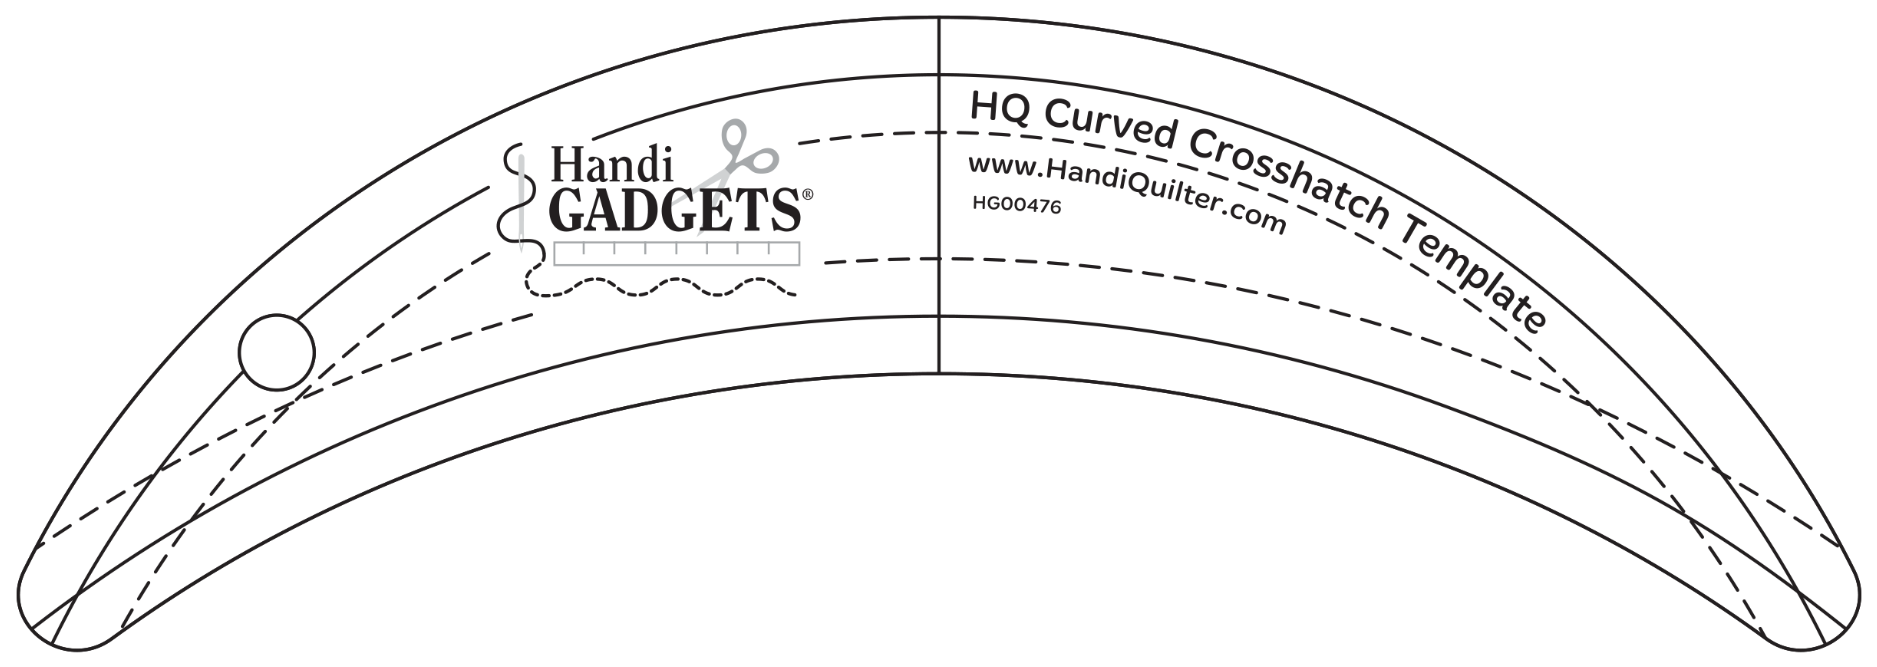 HQ Curved Crosshatch